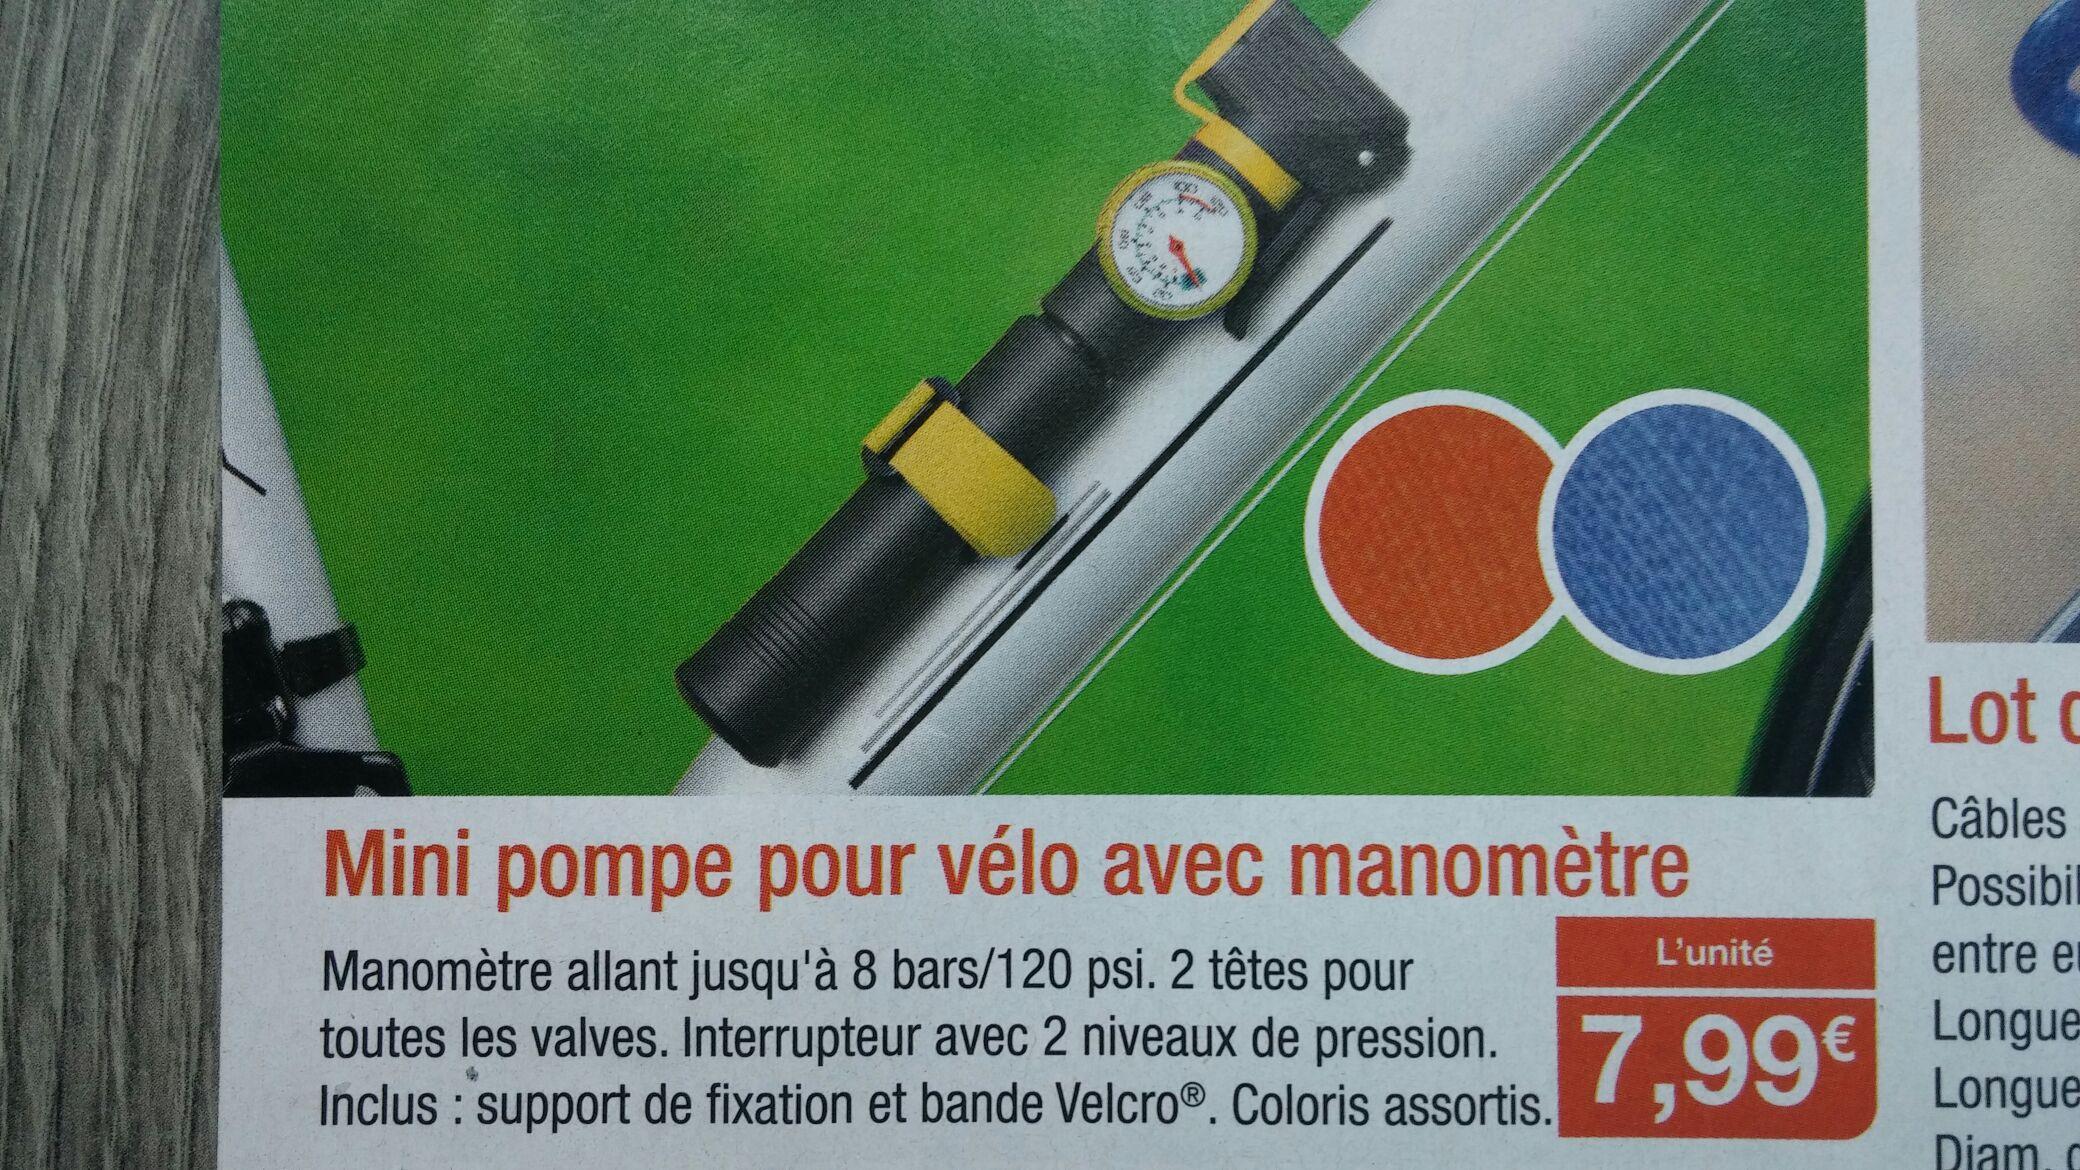 Mini pompe pour vélo avec manometre 8 bars